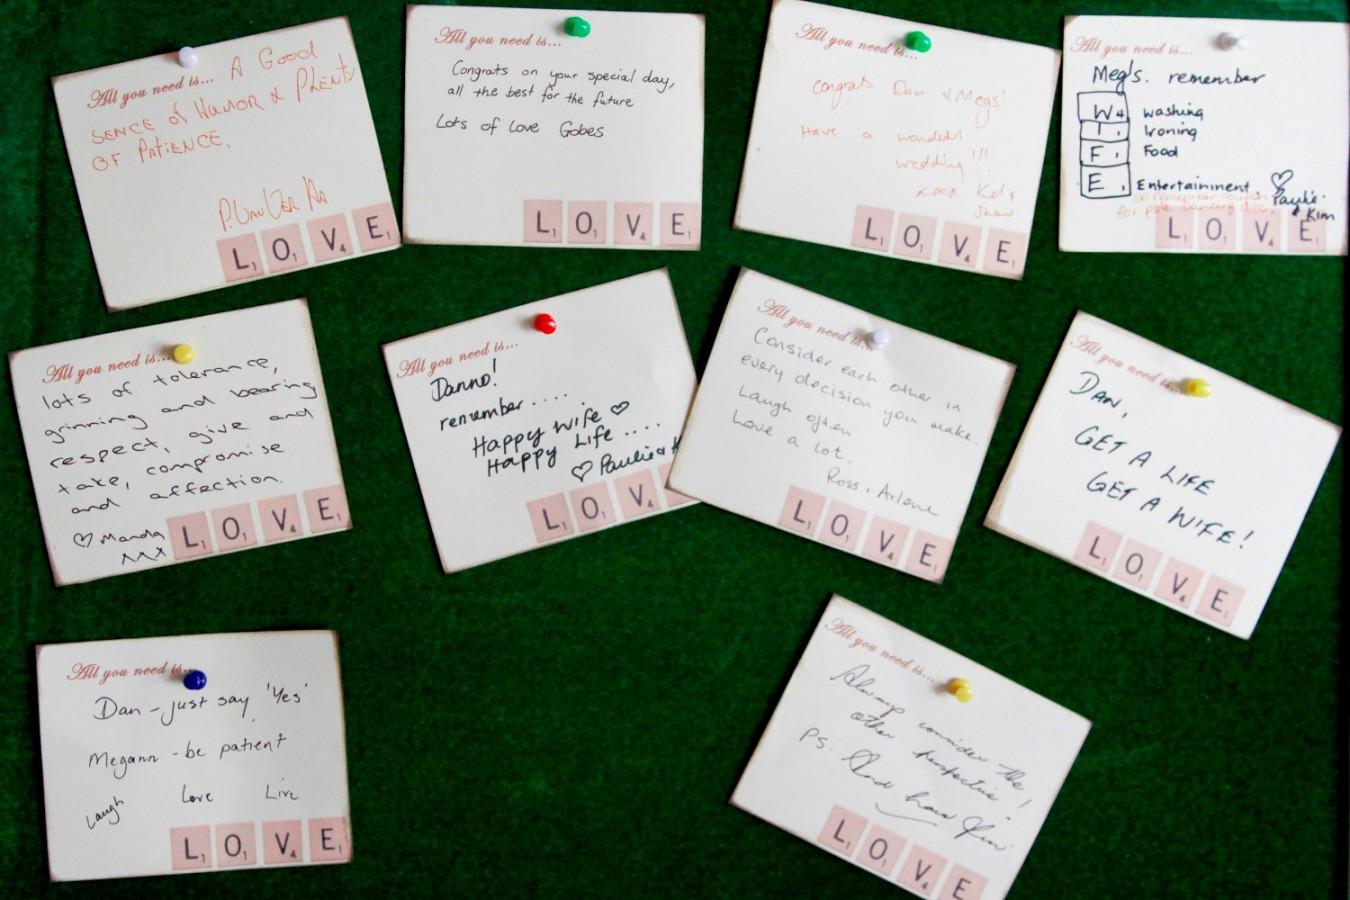 2011.10.16, Megann and Daniel, Ombak Luwung, MJY - Bali Wedding Paradise (3)